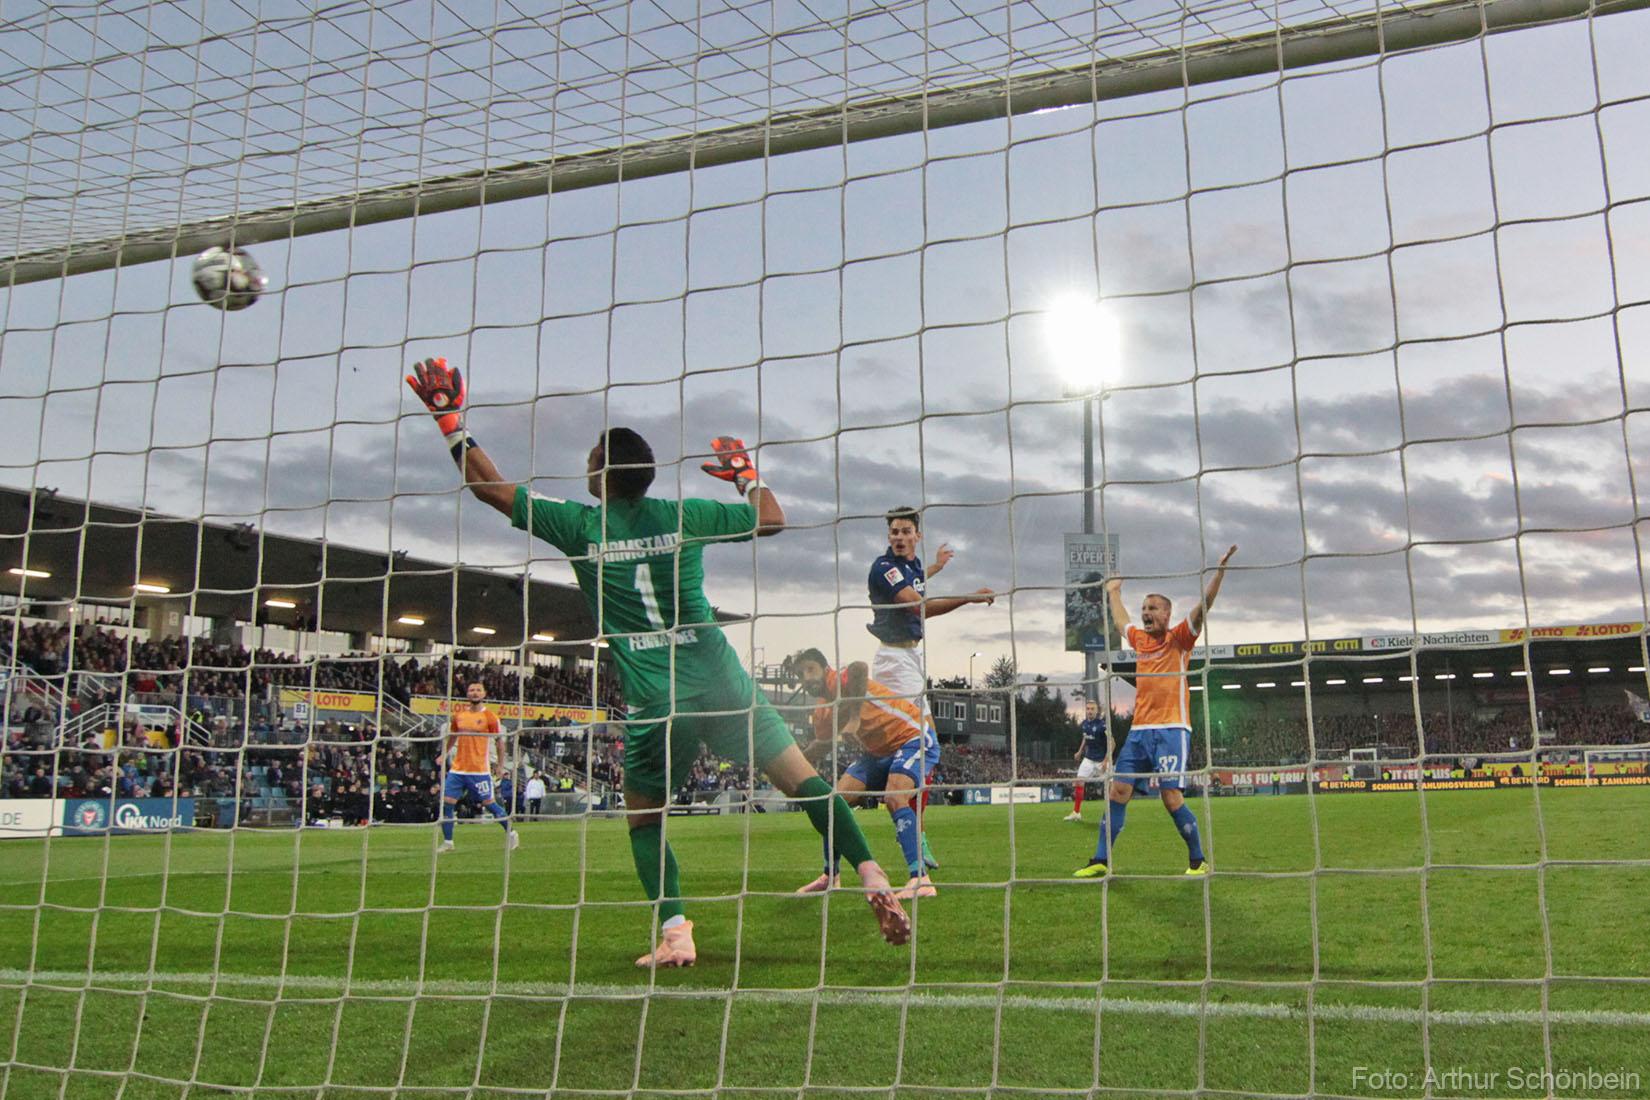 Holstein Kiel – SV Darmstadt 98 4:2 (3:2)